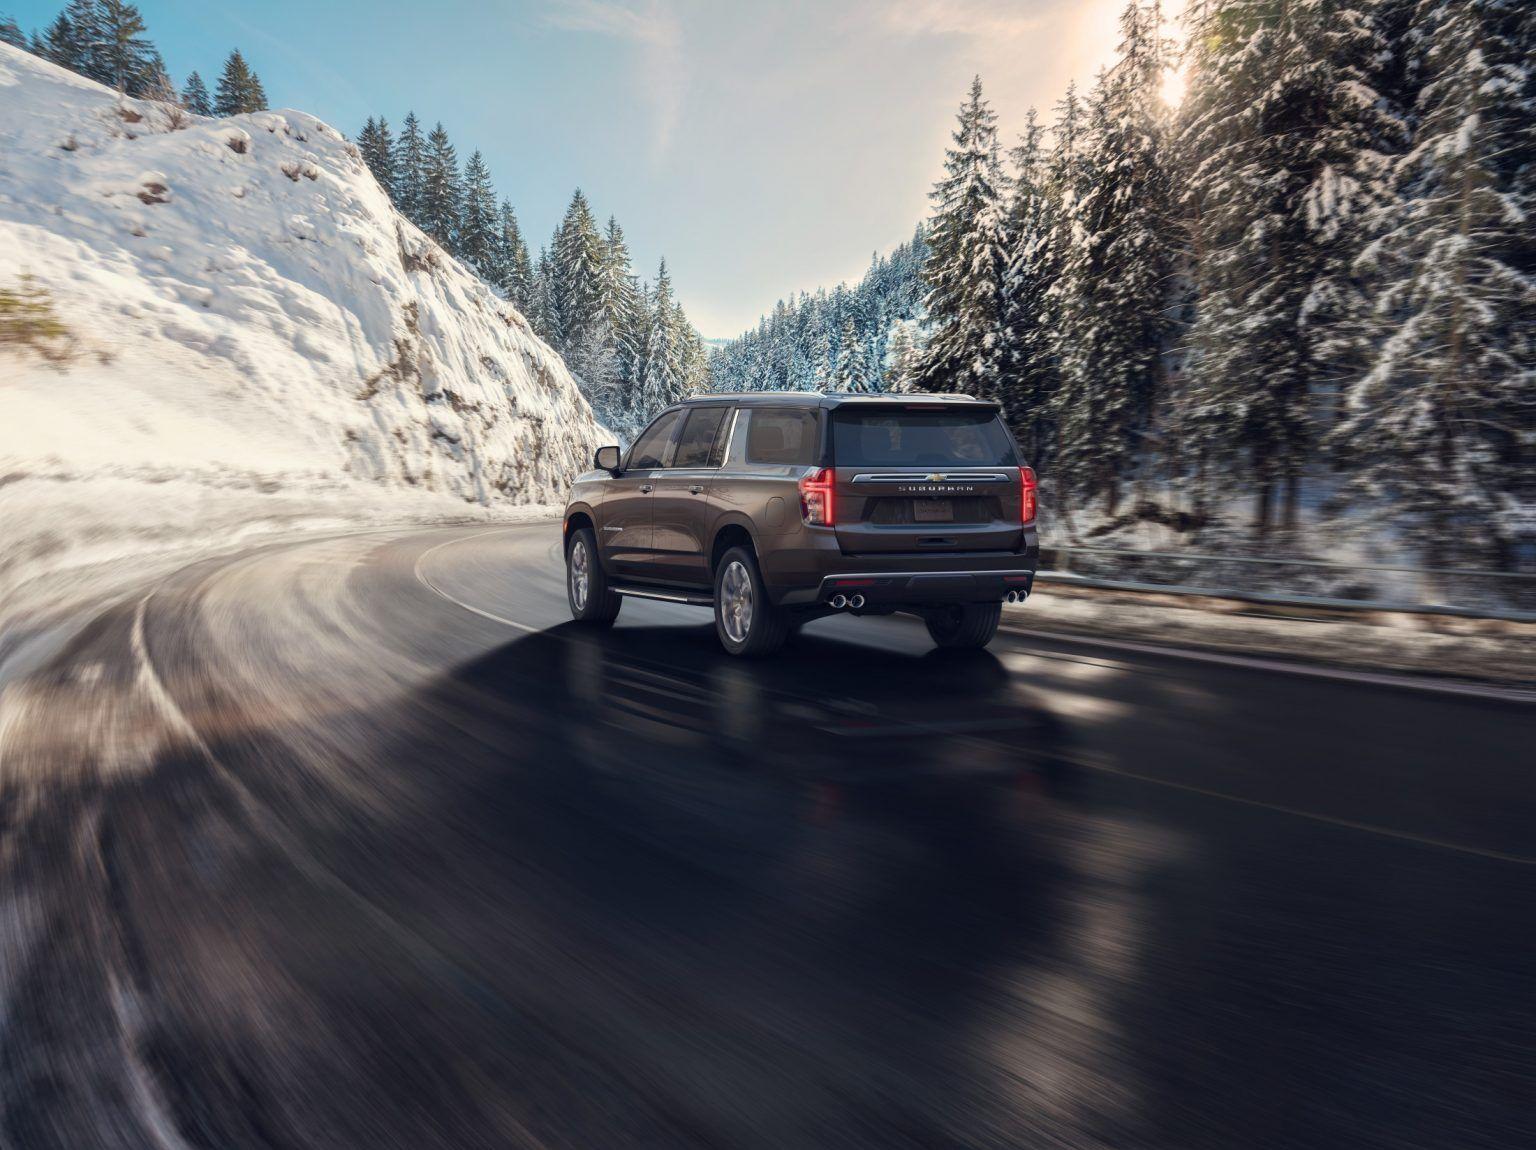 2021 Chevrolet Suburban High Country 002 Chevrolet Suburban